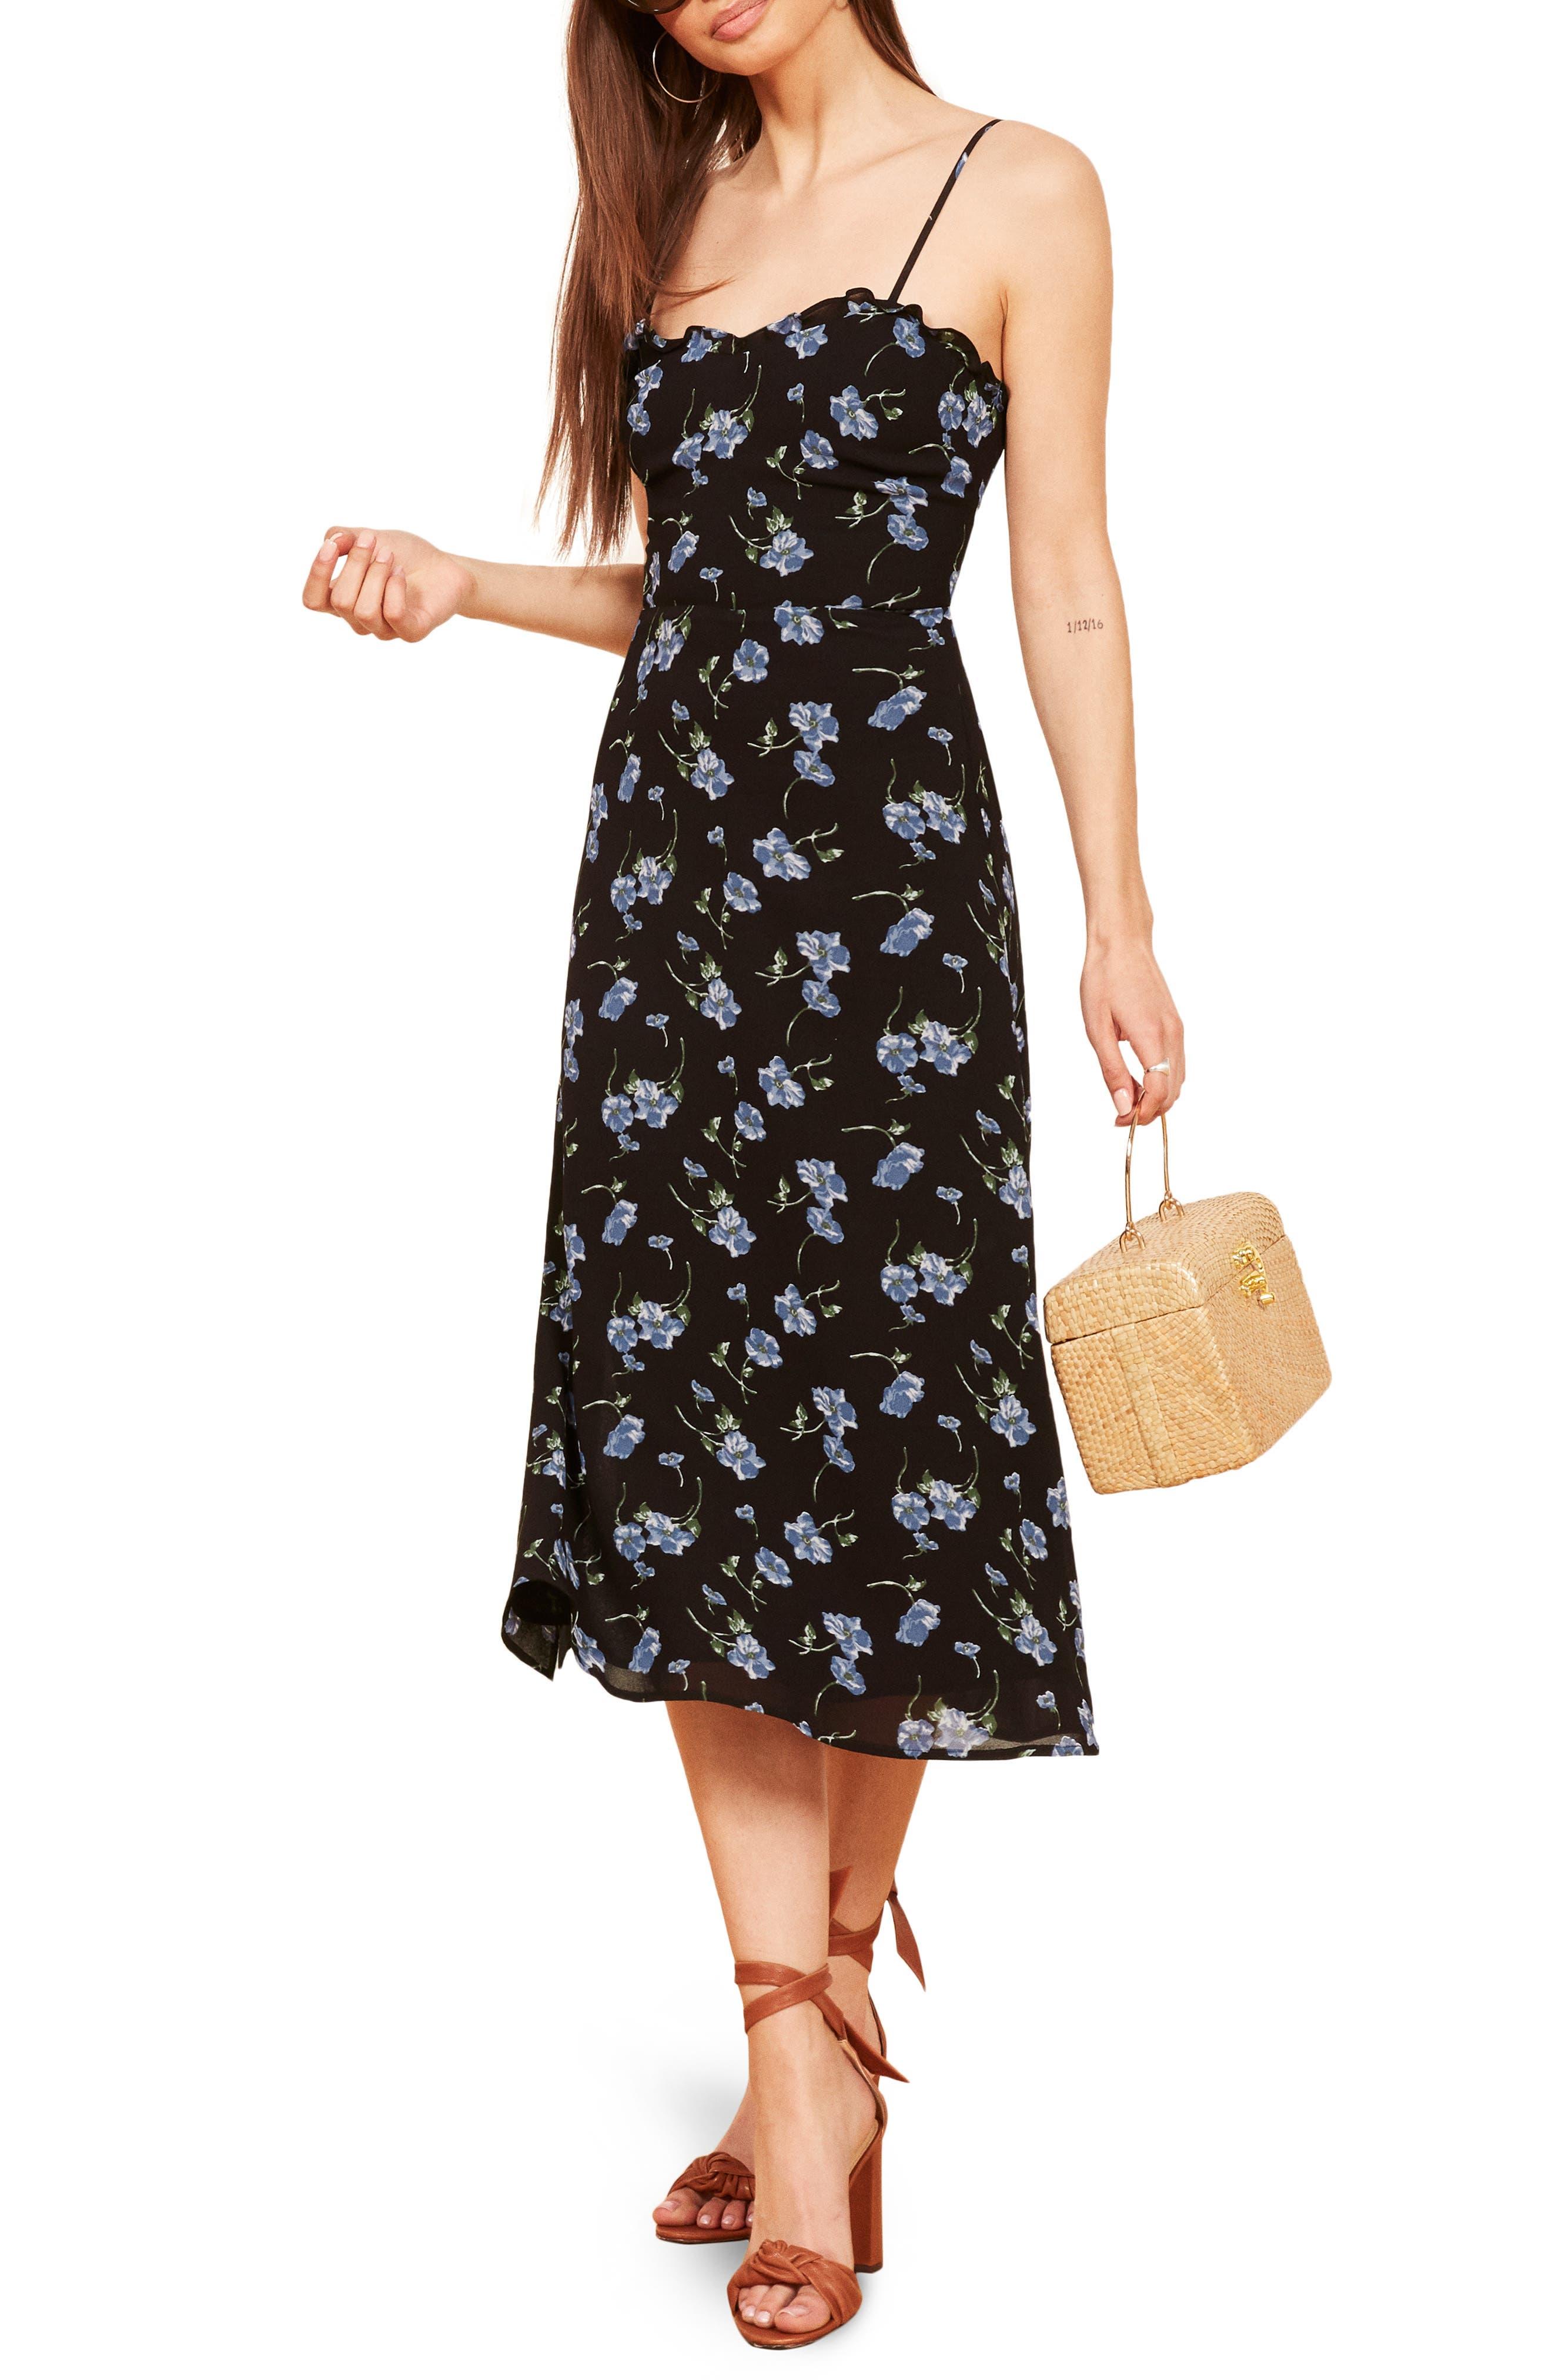 REFORMATION, Cassandra Floral Dress, Main thumbnail 1, color, 001